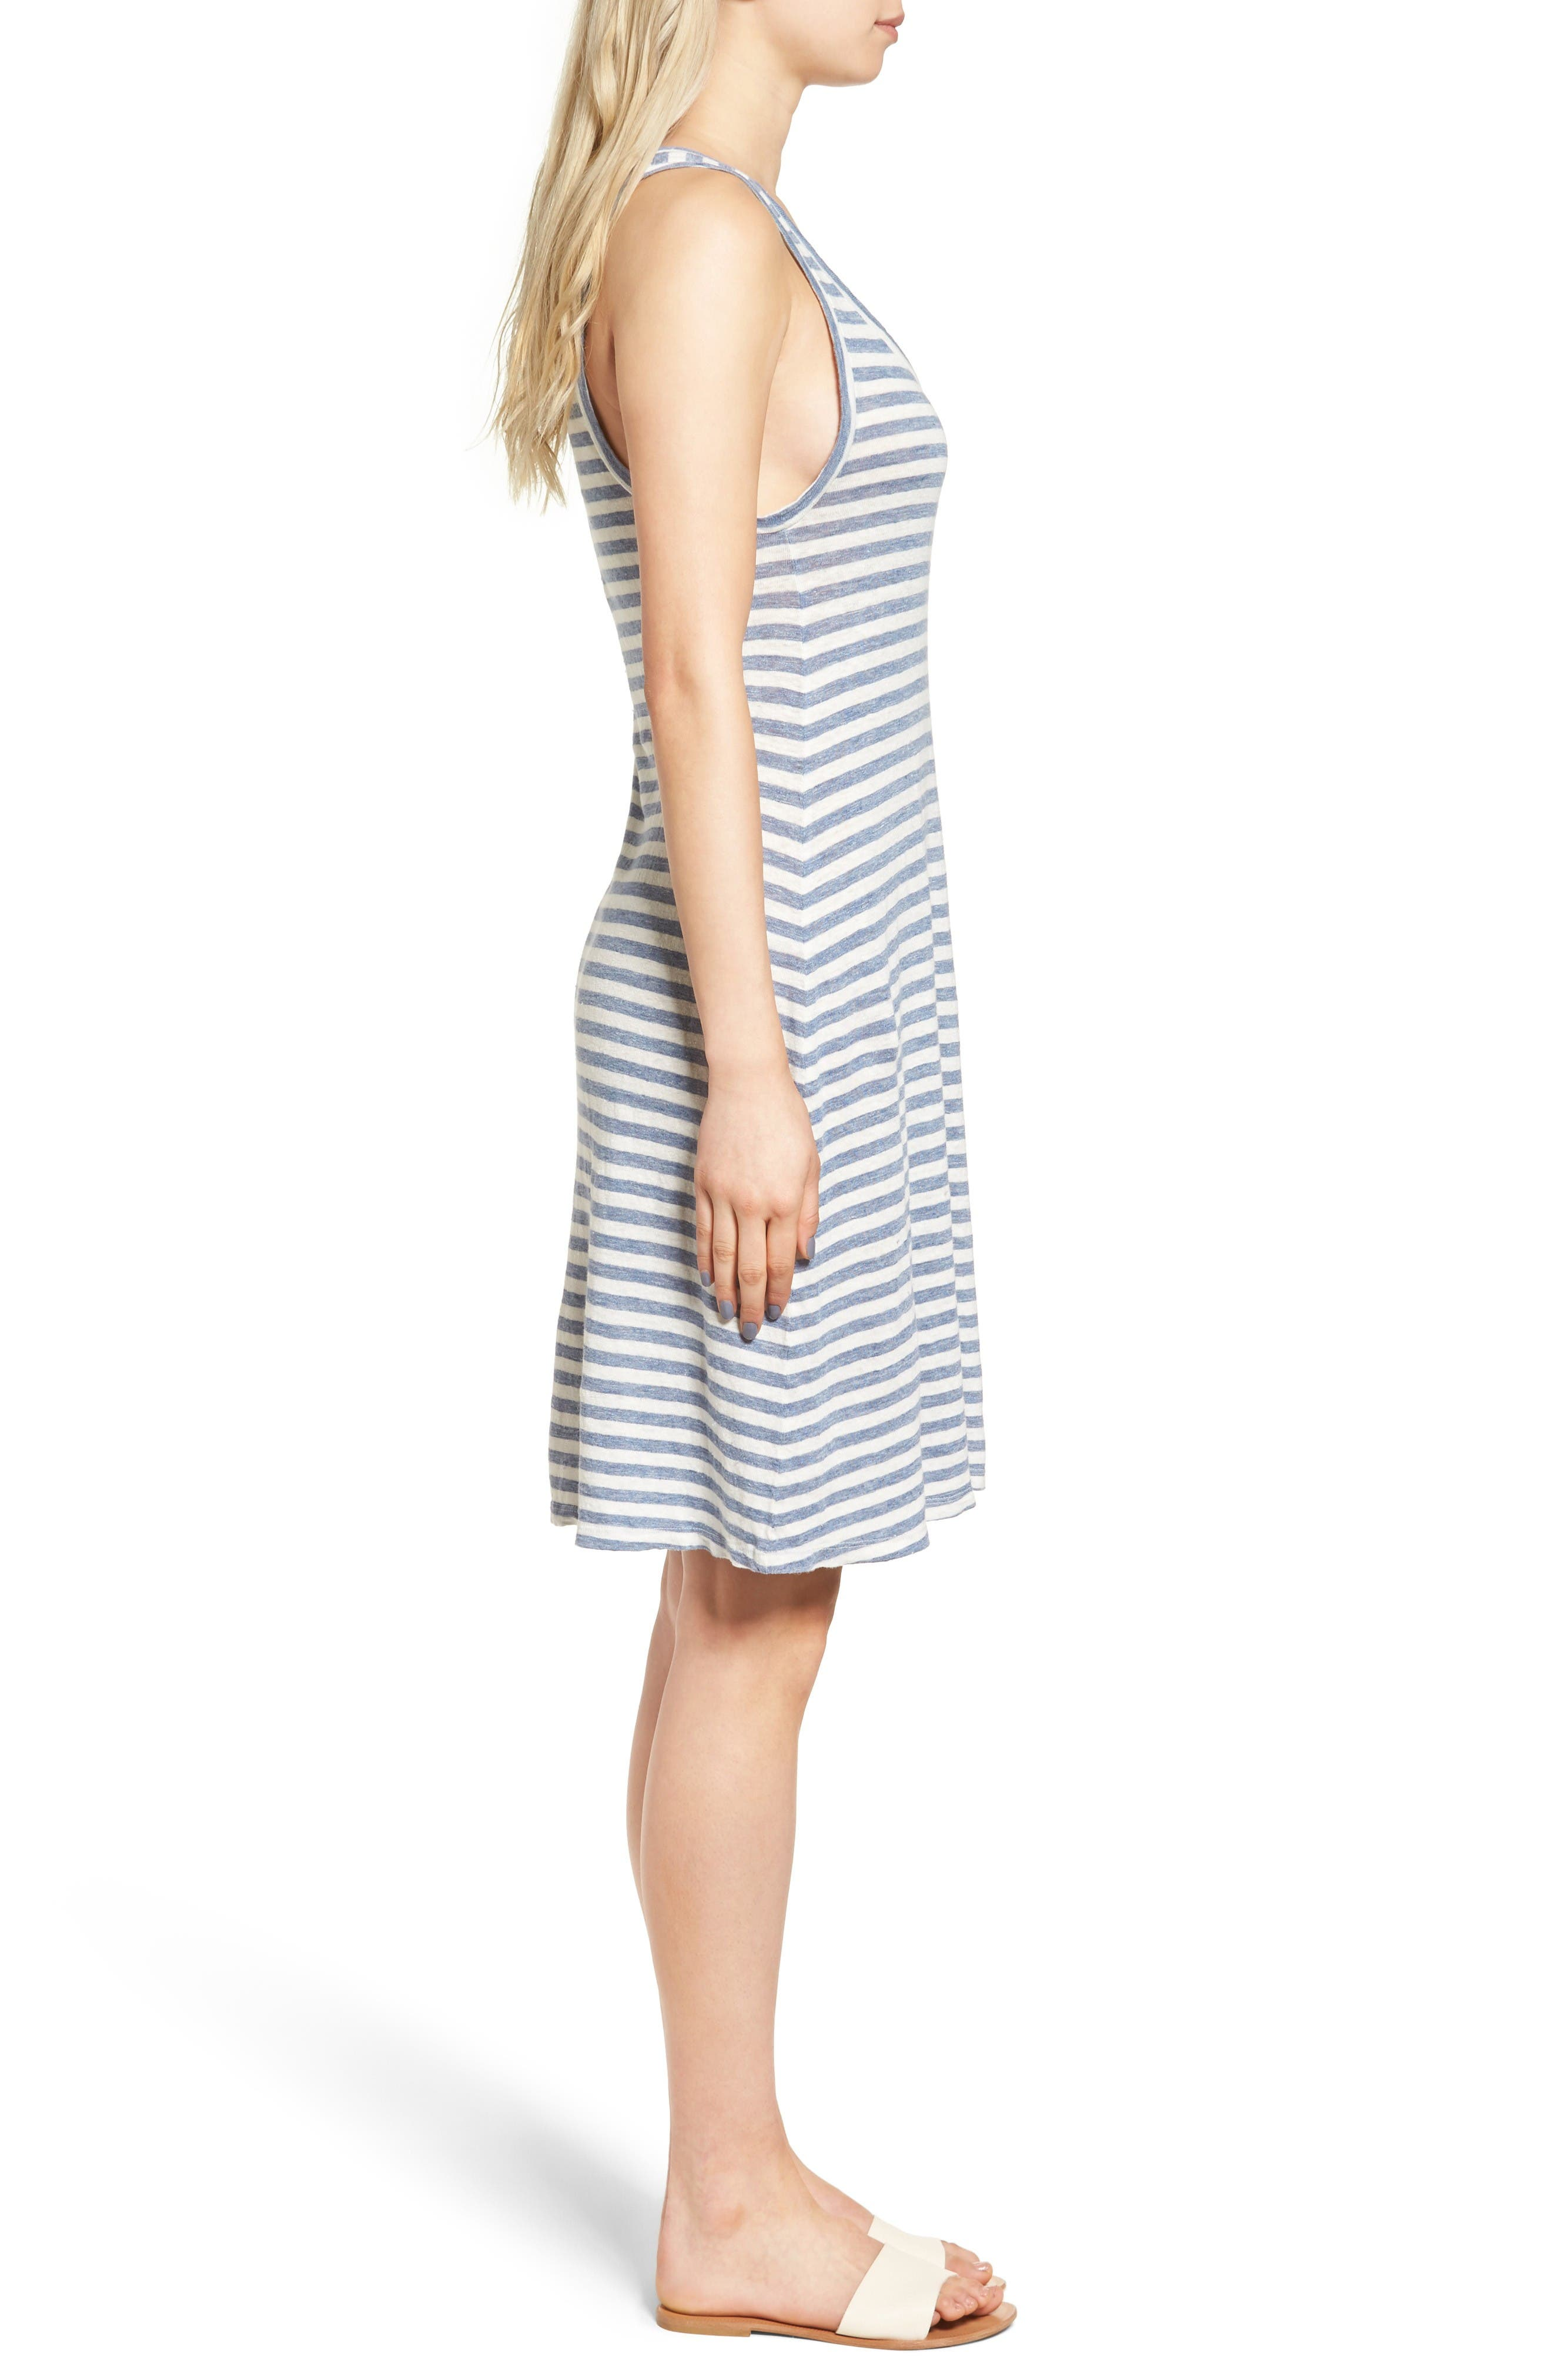 Avril Linen Tank Dress,                             Alternate thumbnail 3, color,                             Heather Blue/ Powder White